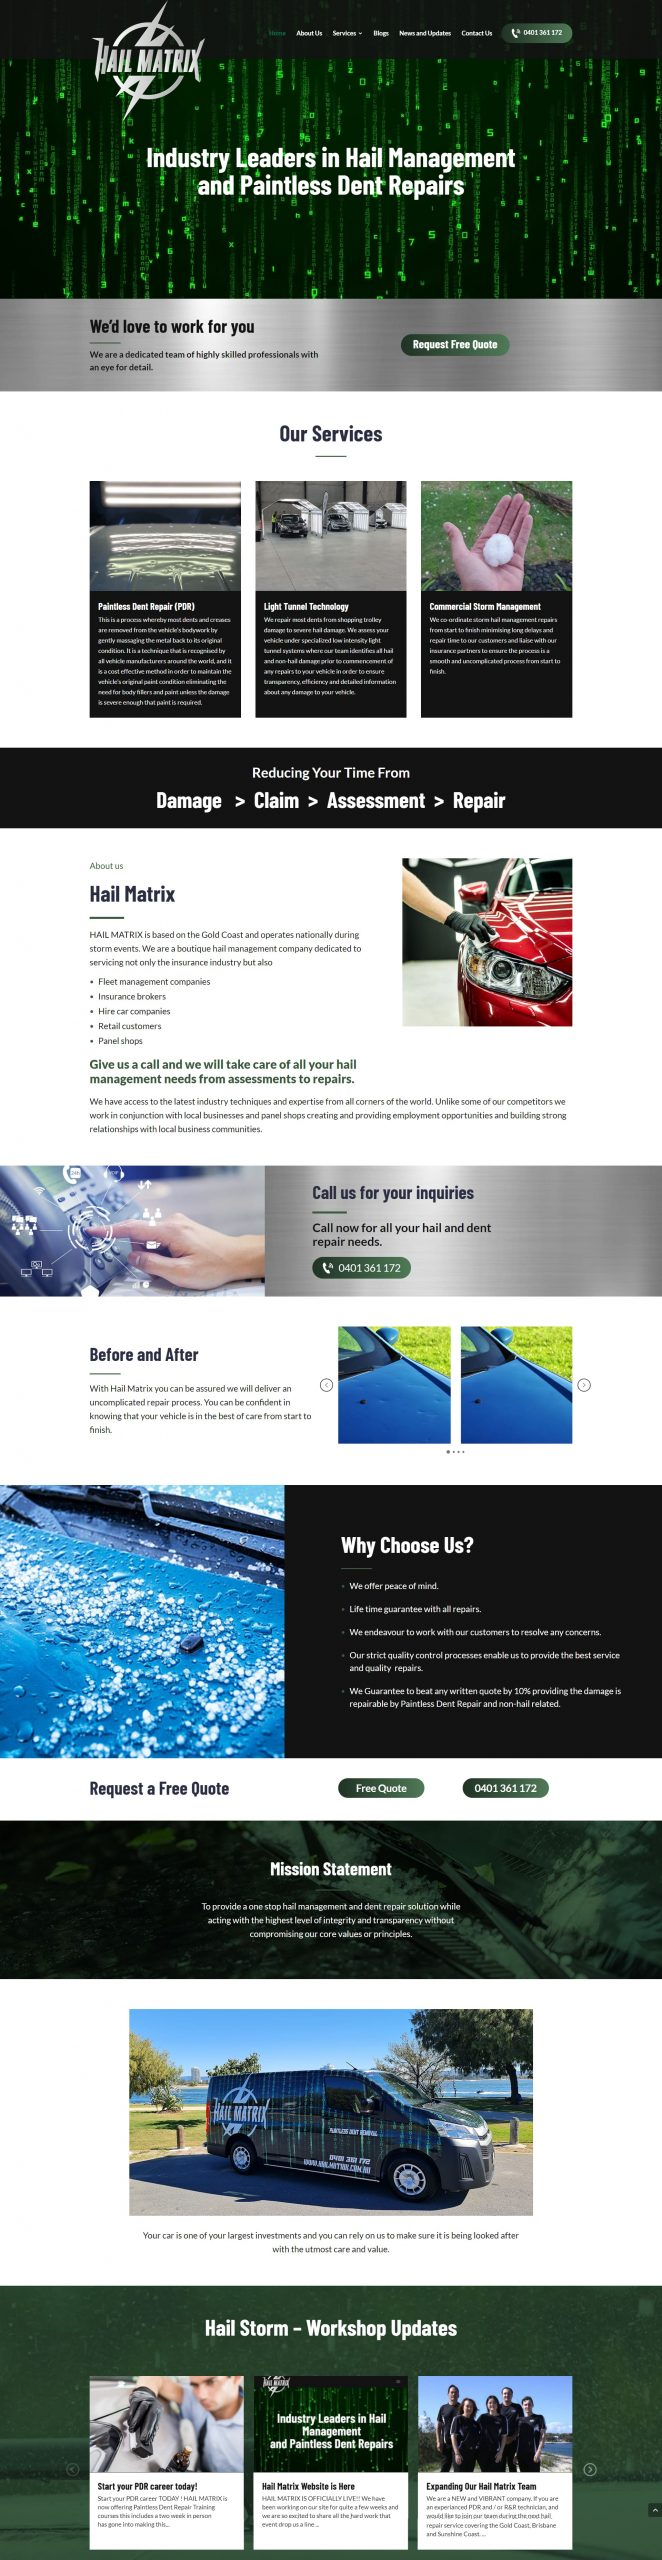 HailMatrix Homepage